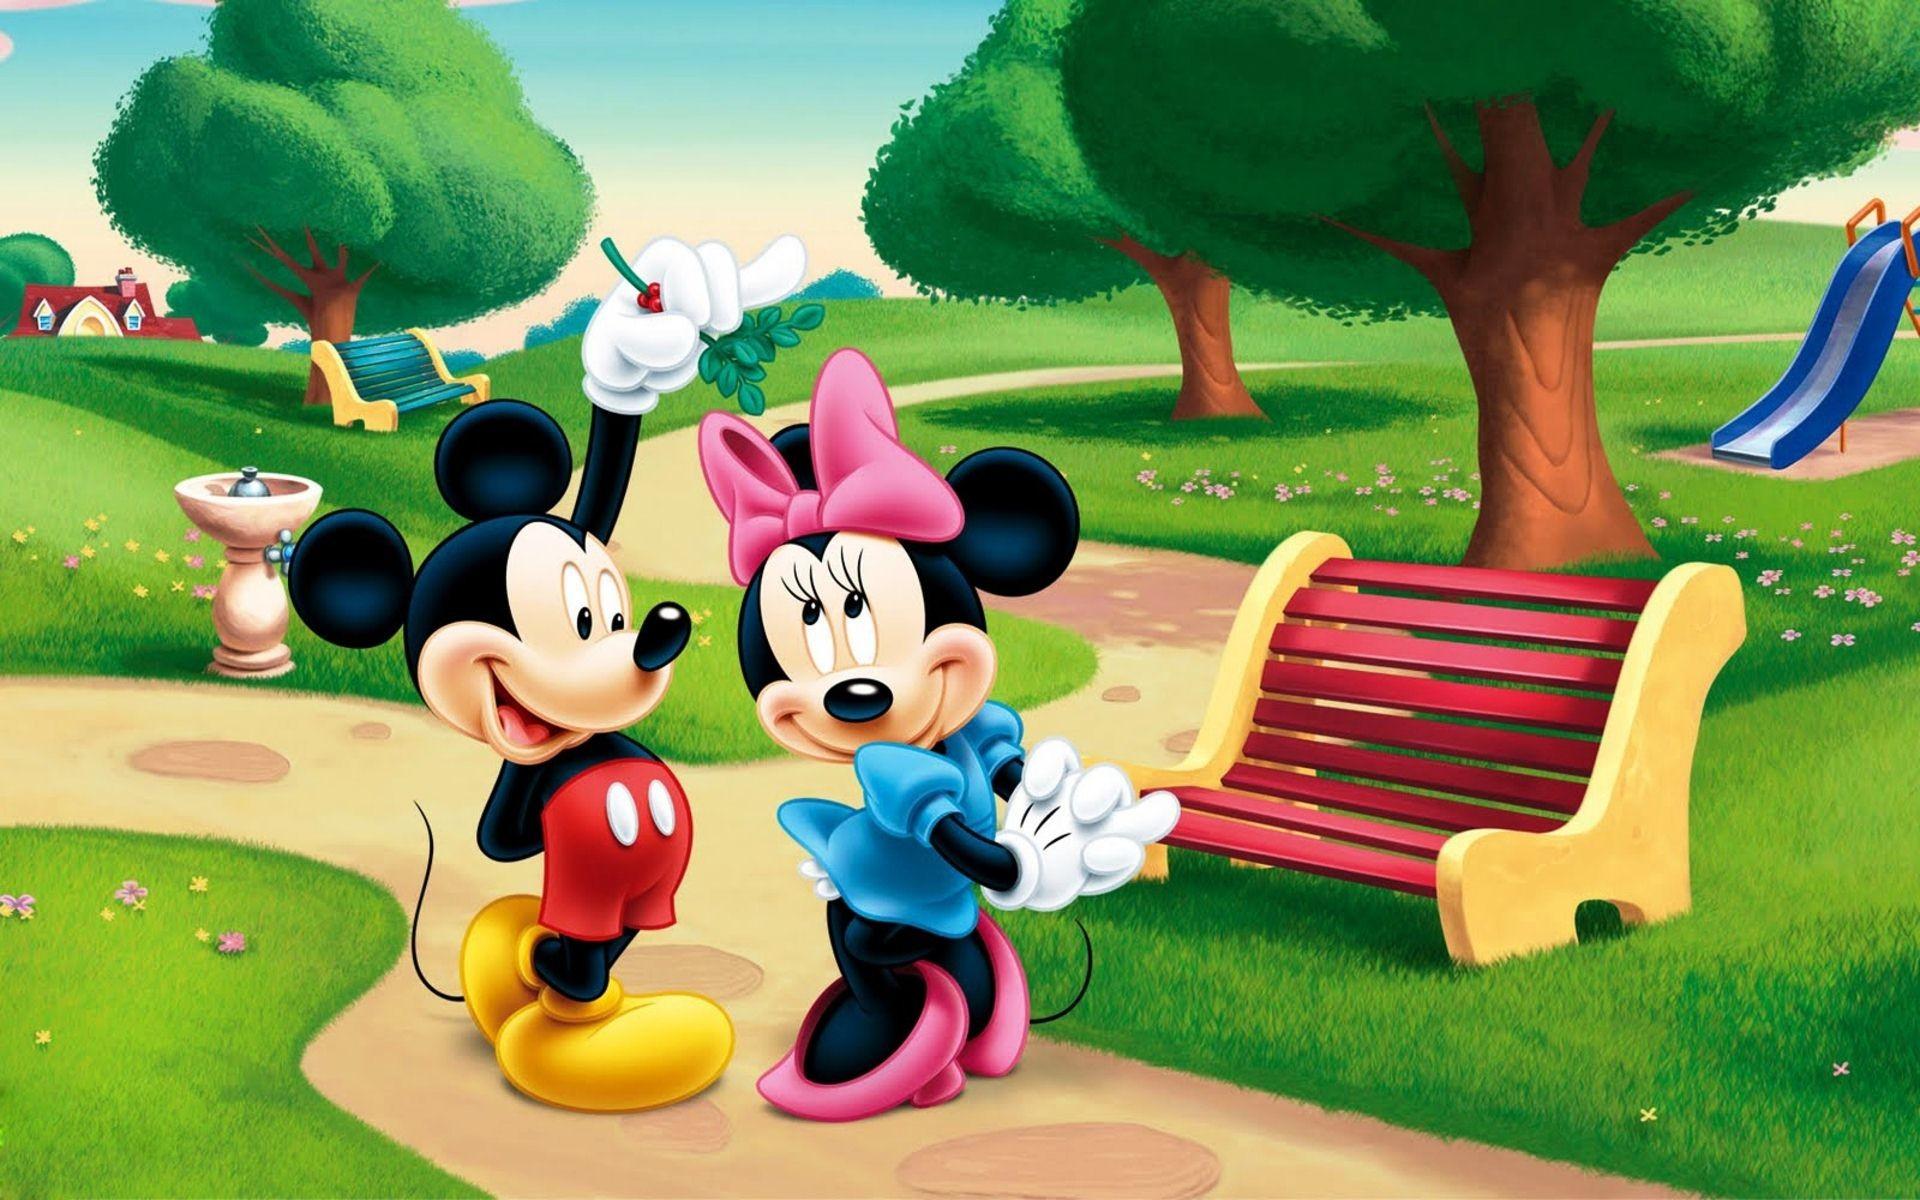 Disney characters wallpaper 51 images - Disney tablet wallpaper ...